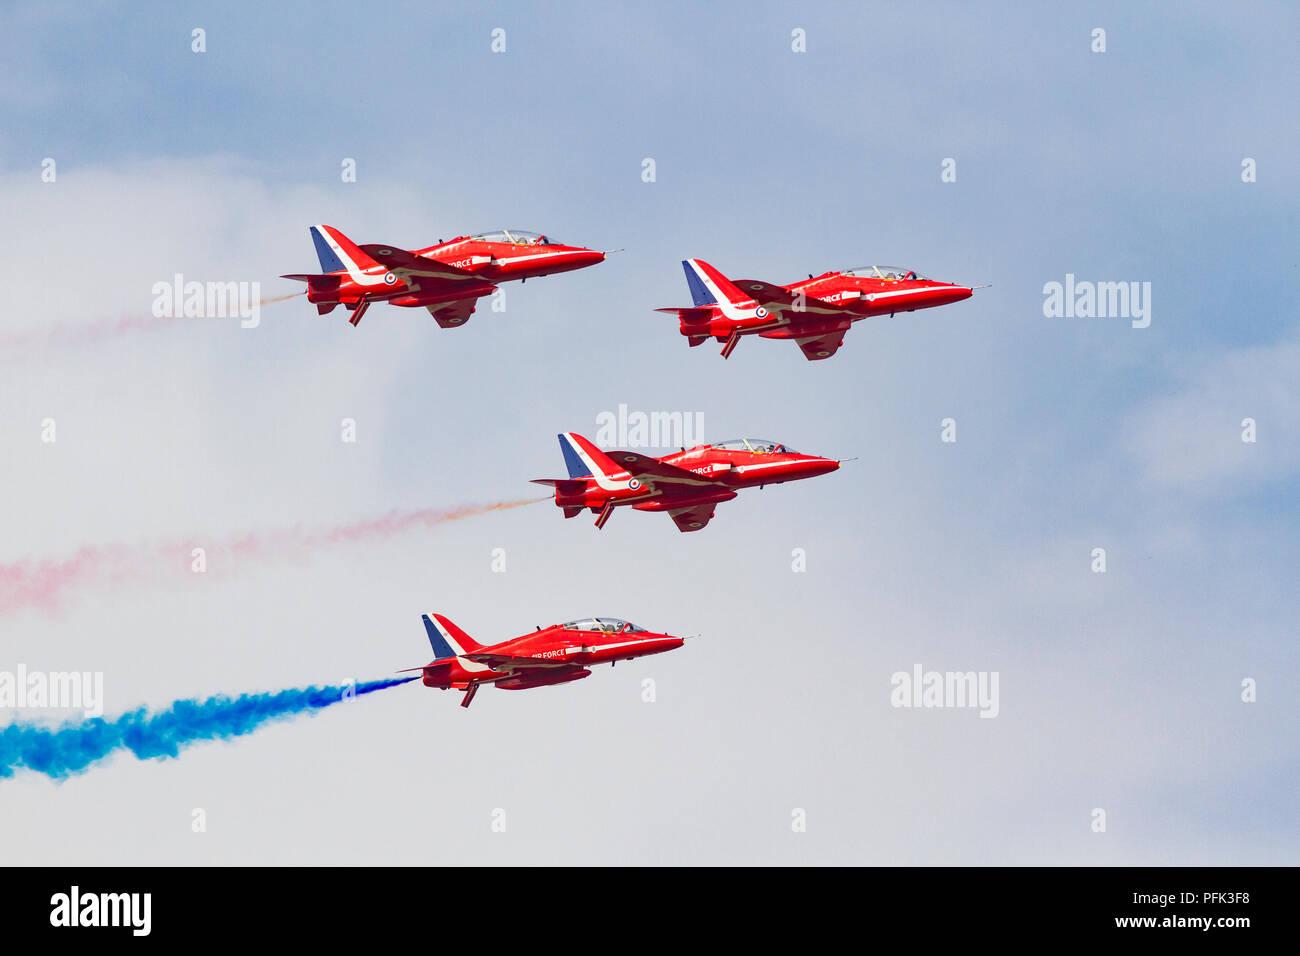 Royal Air Force Red Arrows aerobatic display team performing at Blackpool Air Show - Stock Image